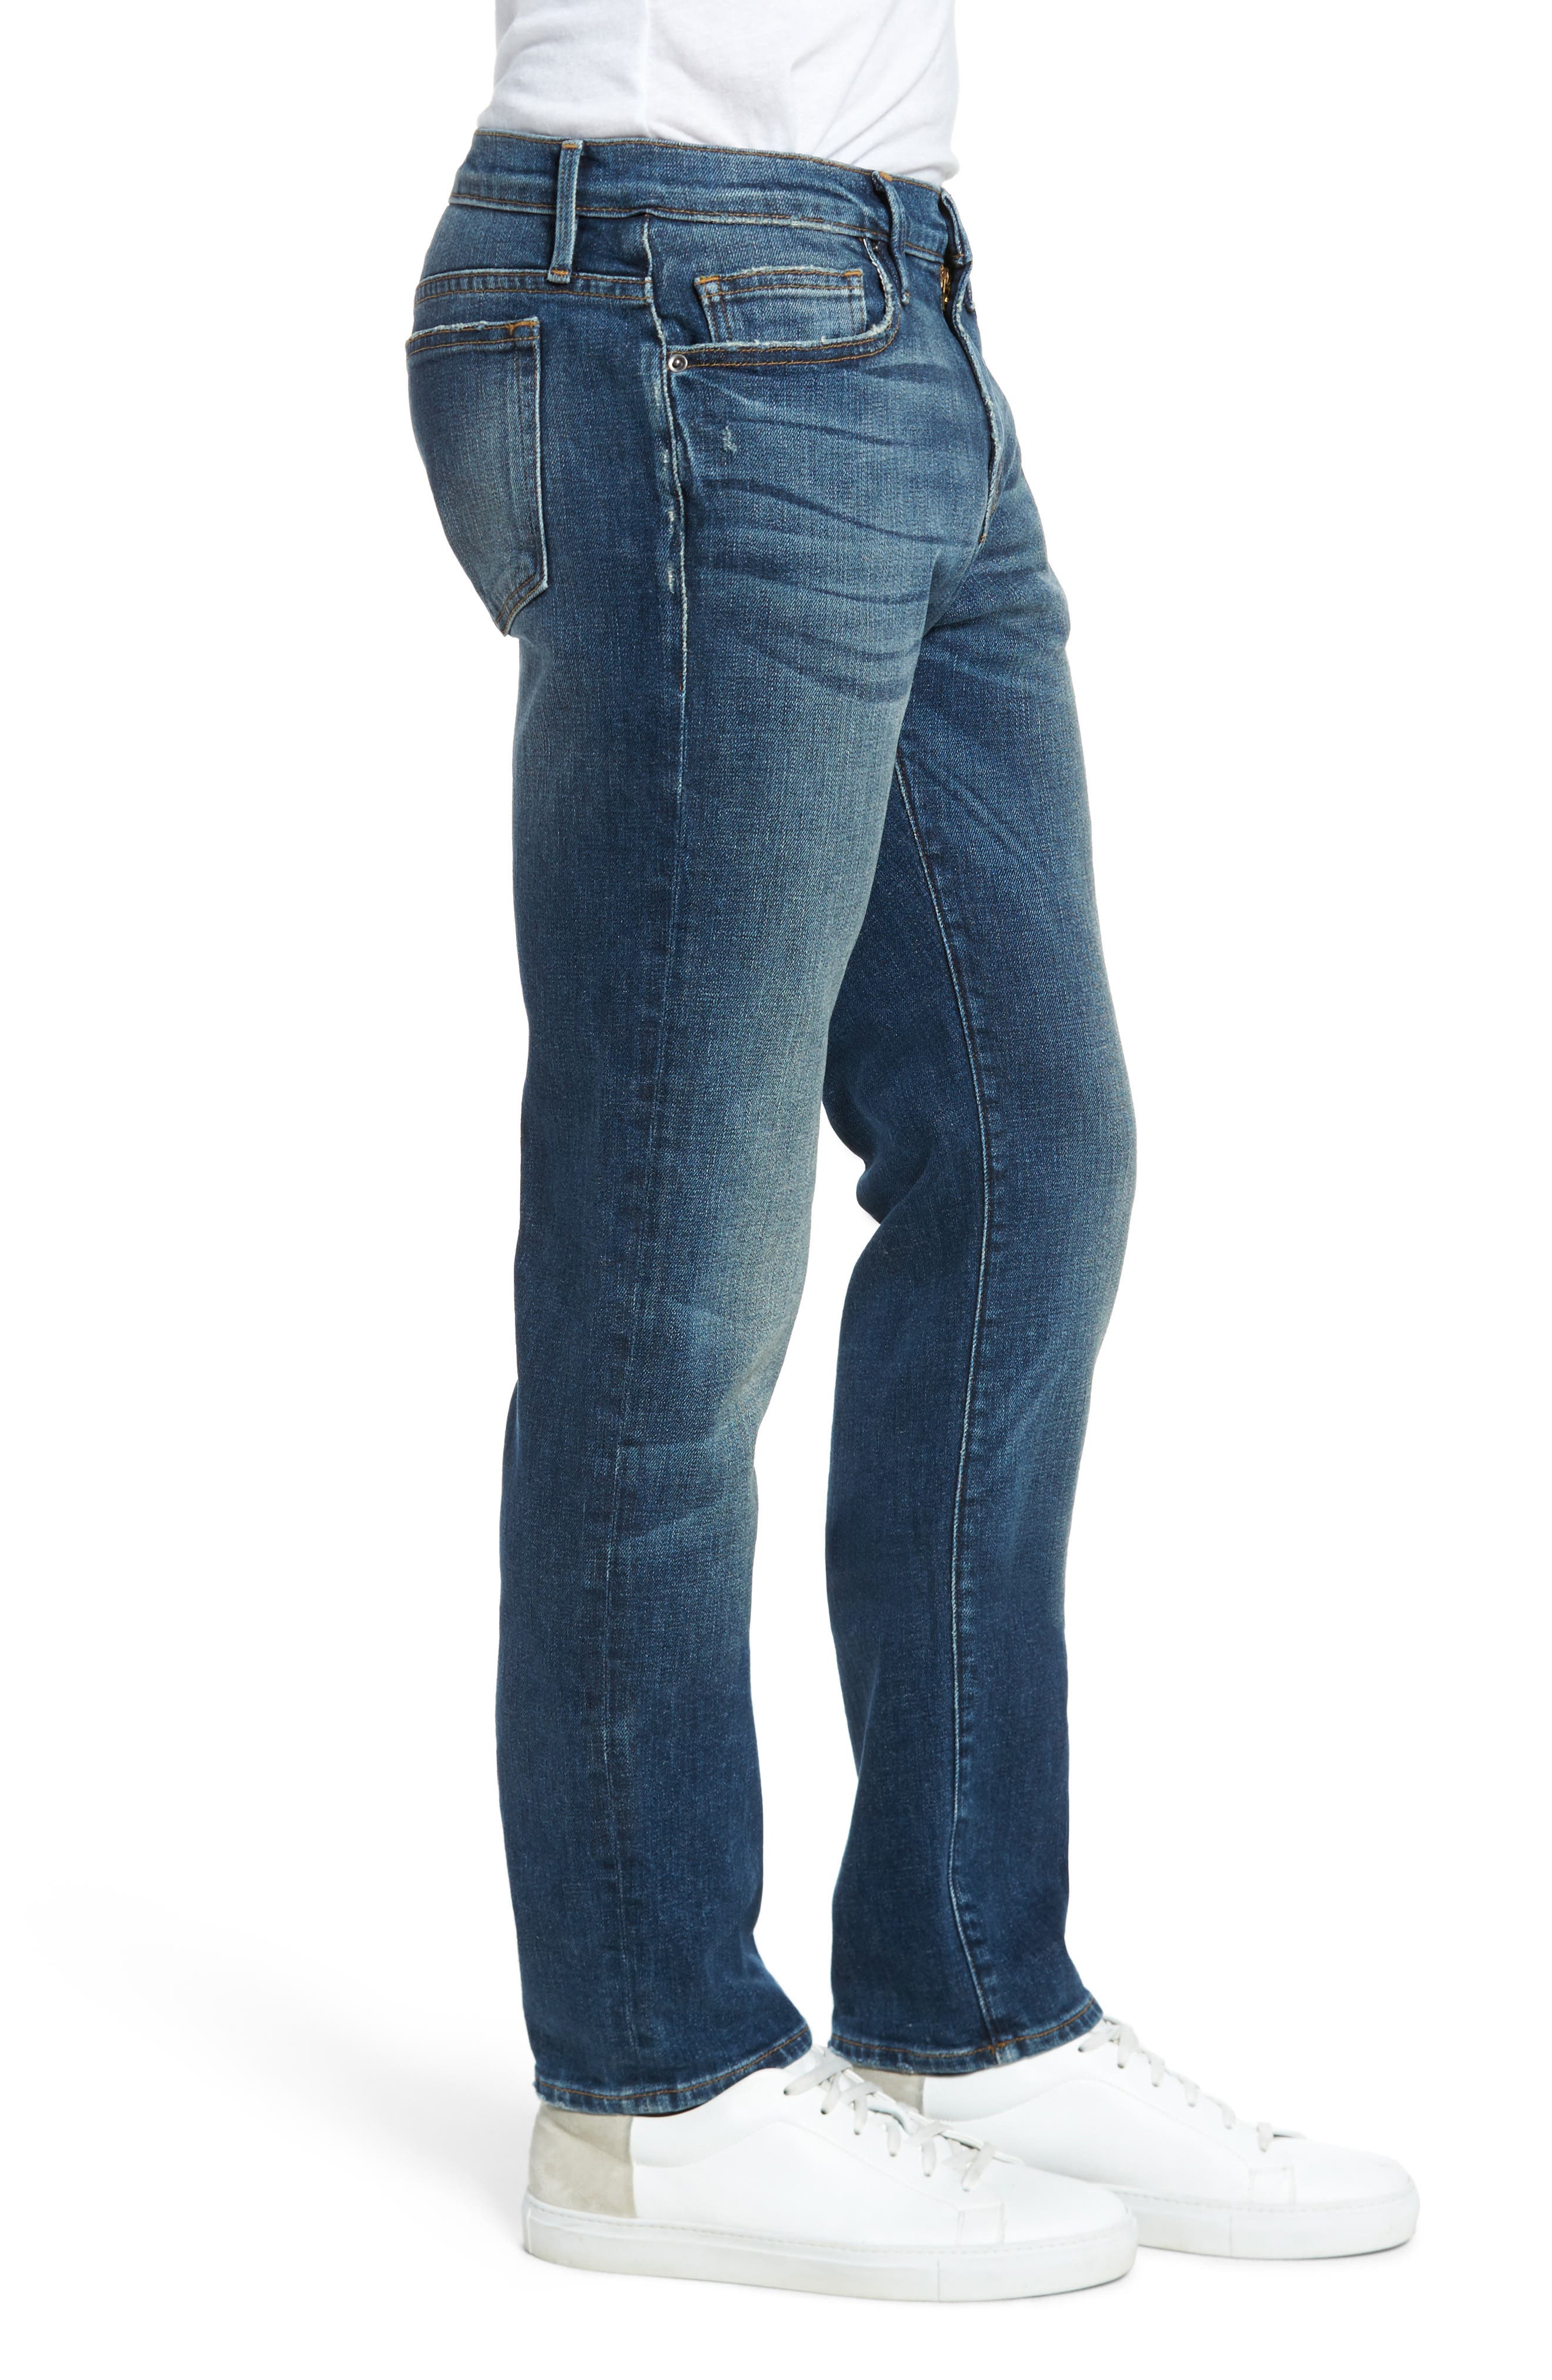 L'Homme Slim Fit Jeans,                             Alternate thumbnail 3, color,                             Salt Lake